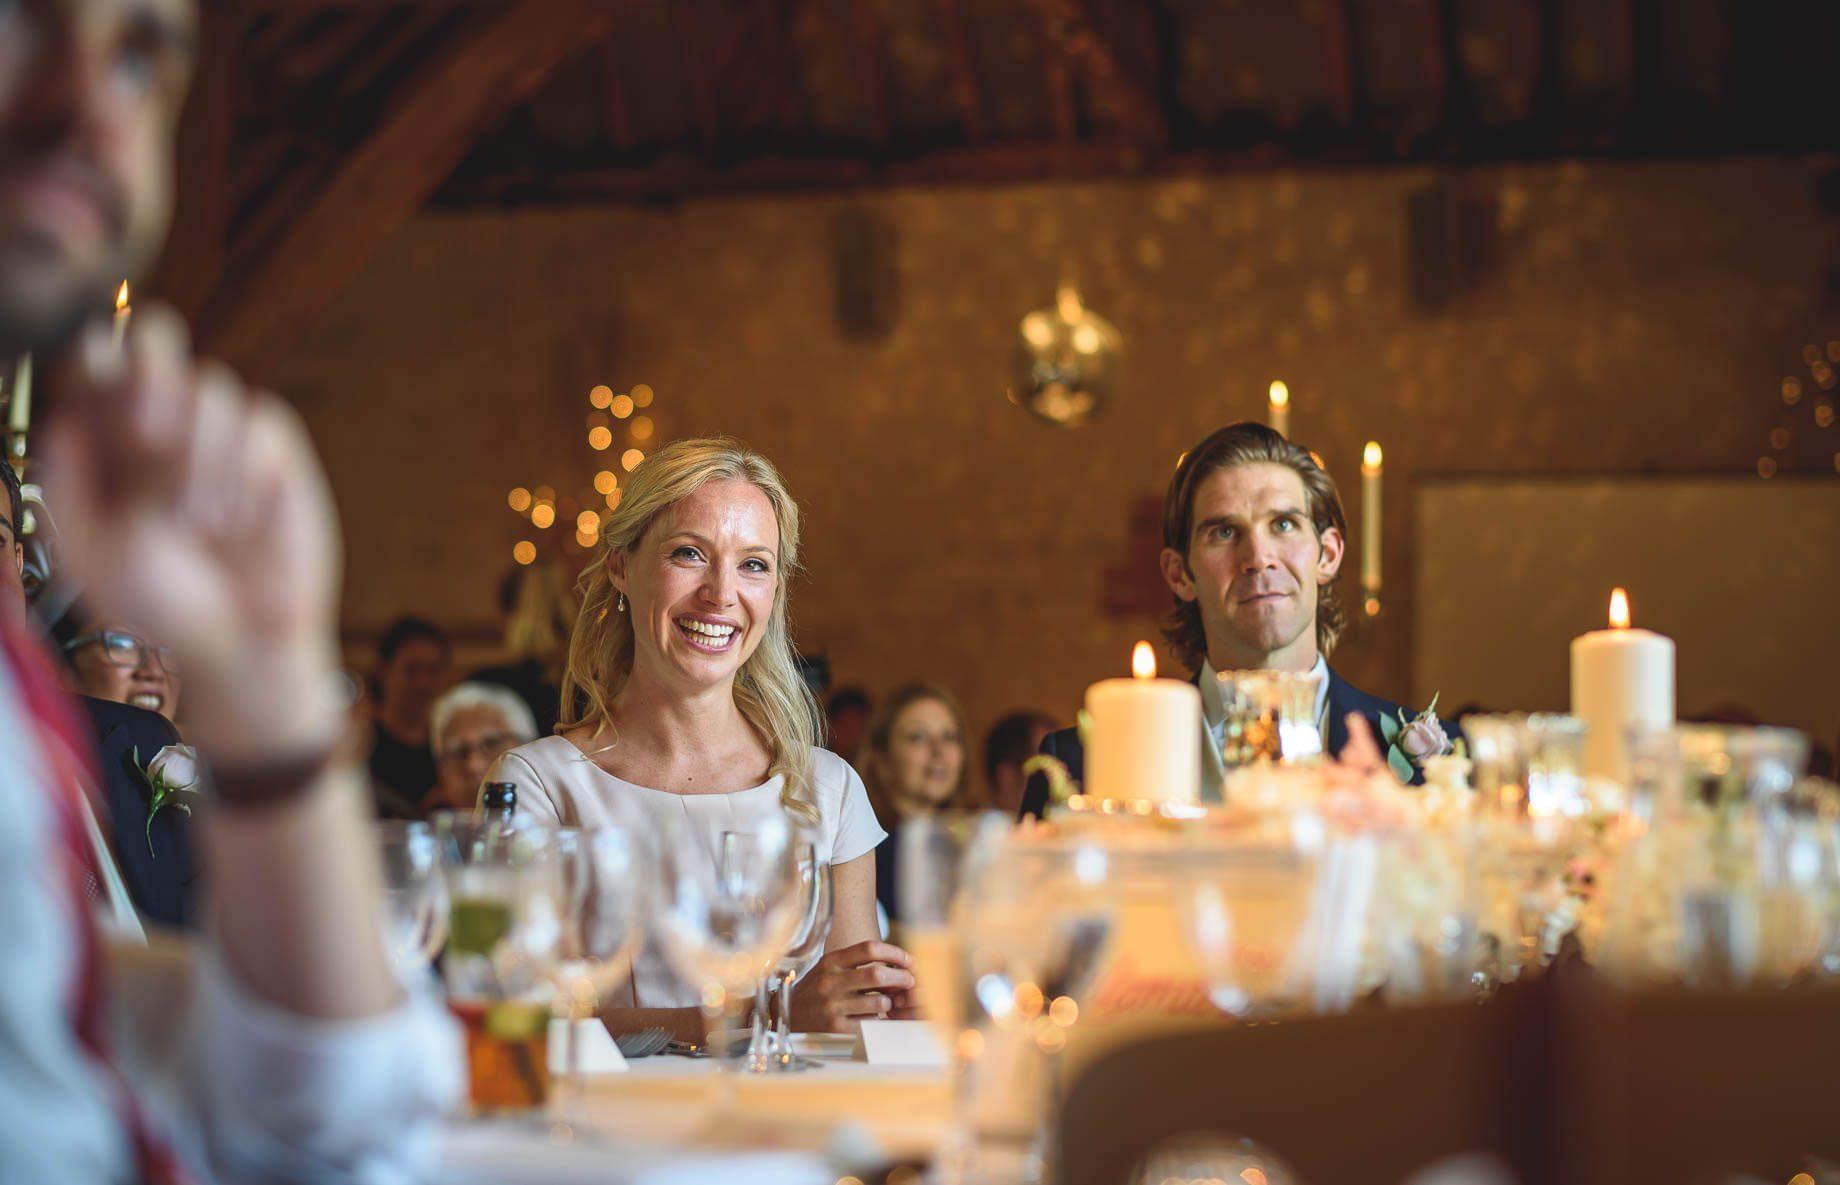 Bury Court Barn Wedding Photography - Caroline and Rob (129 of 219)